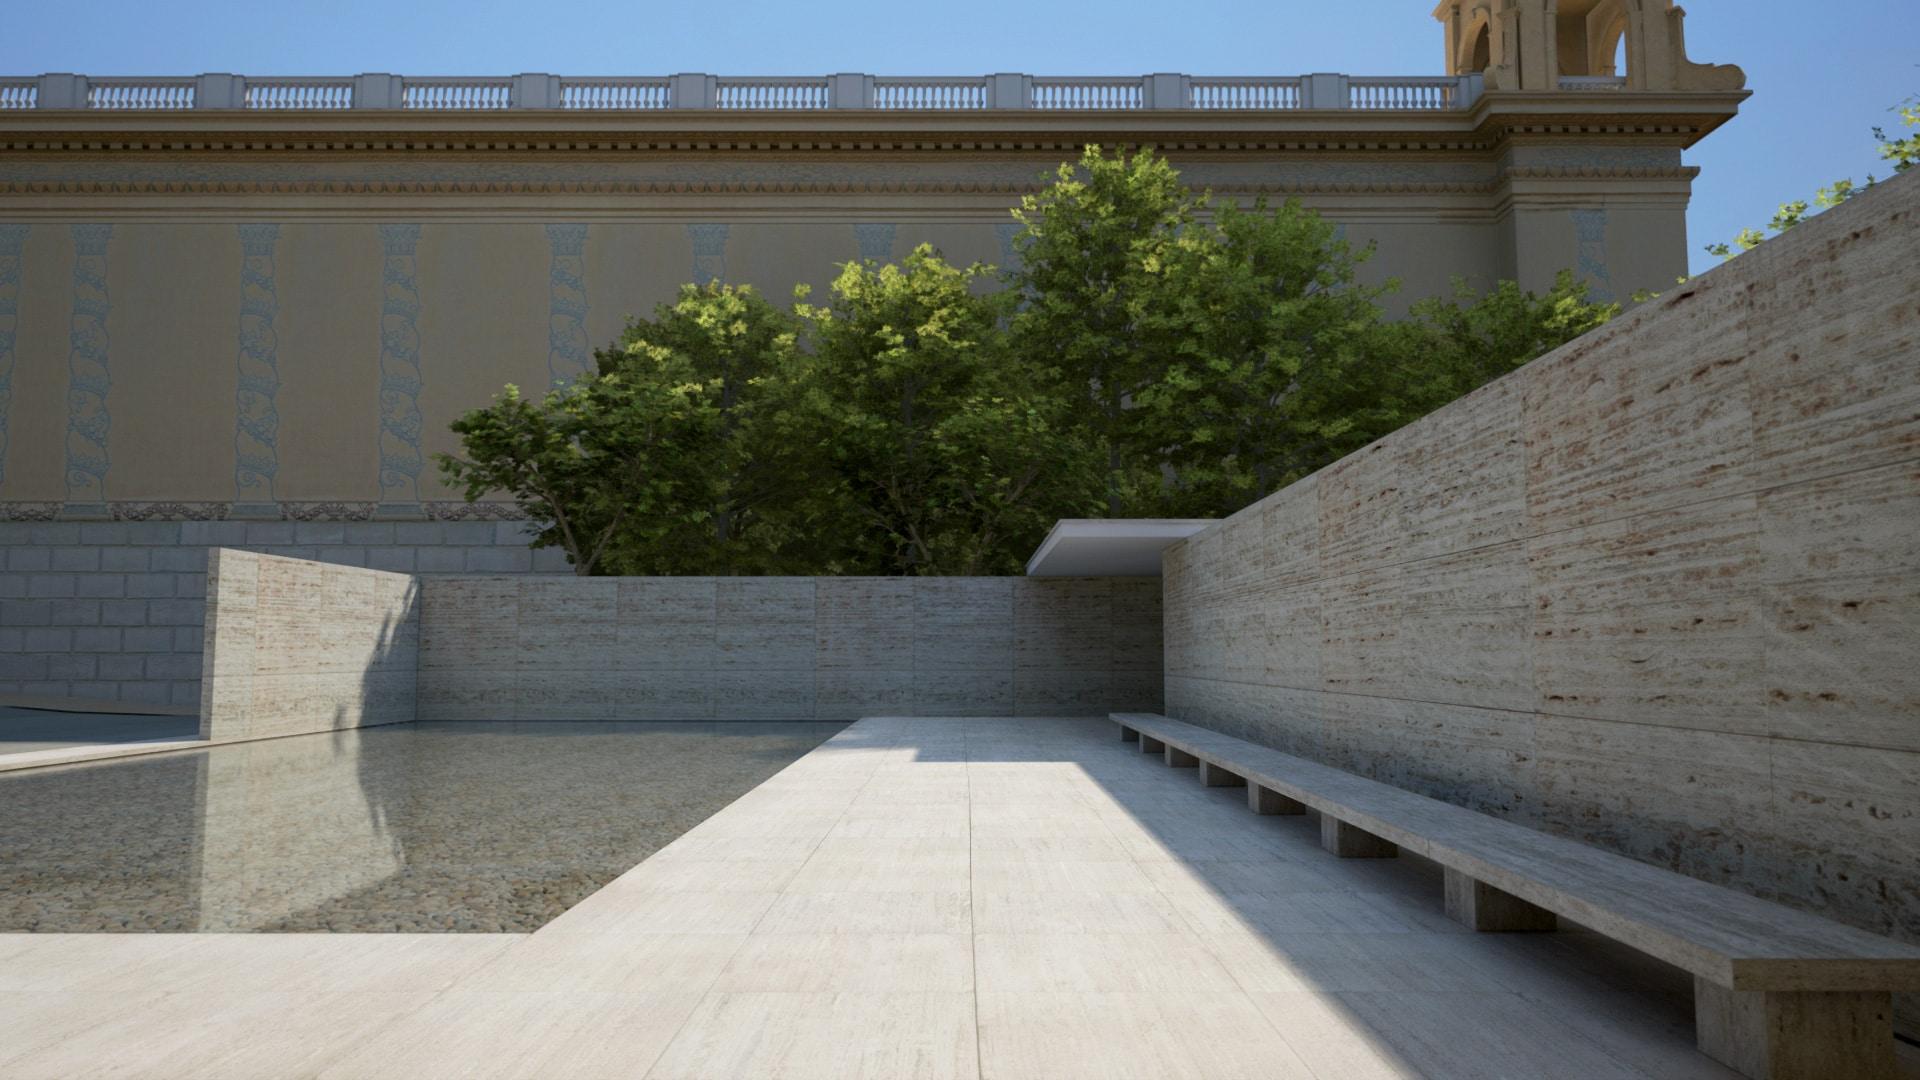 Barcelona pavillion ue4arch for Unreal engine 4 architecture